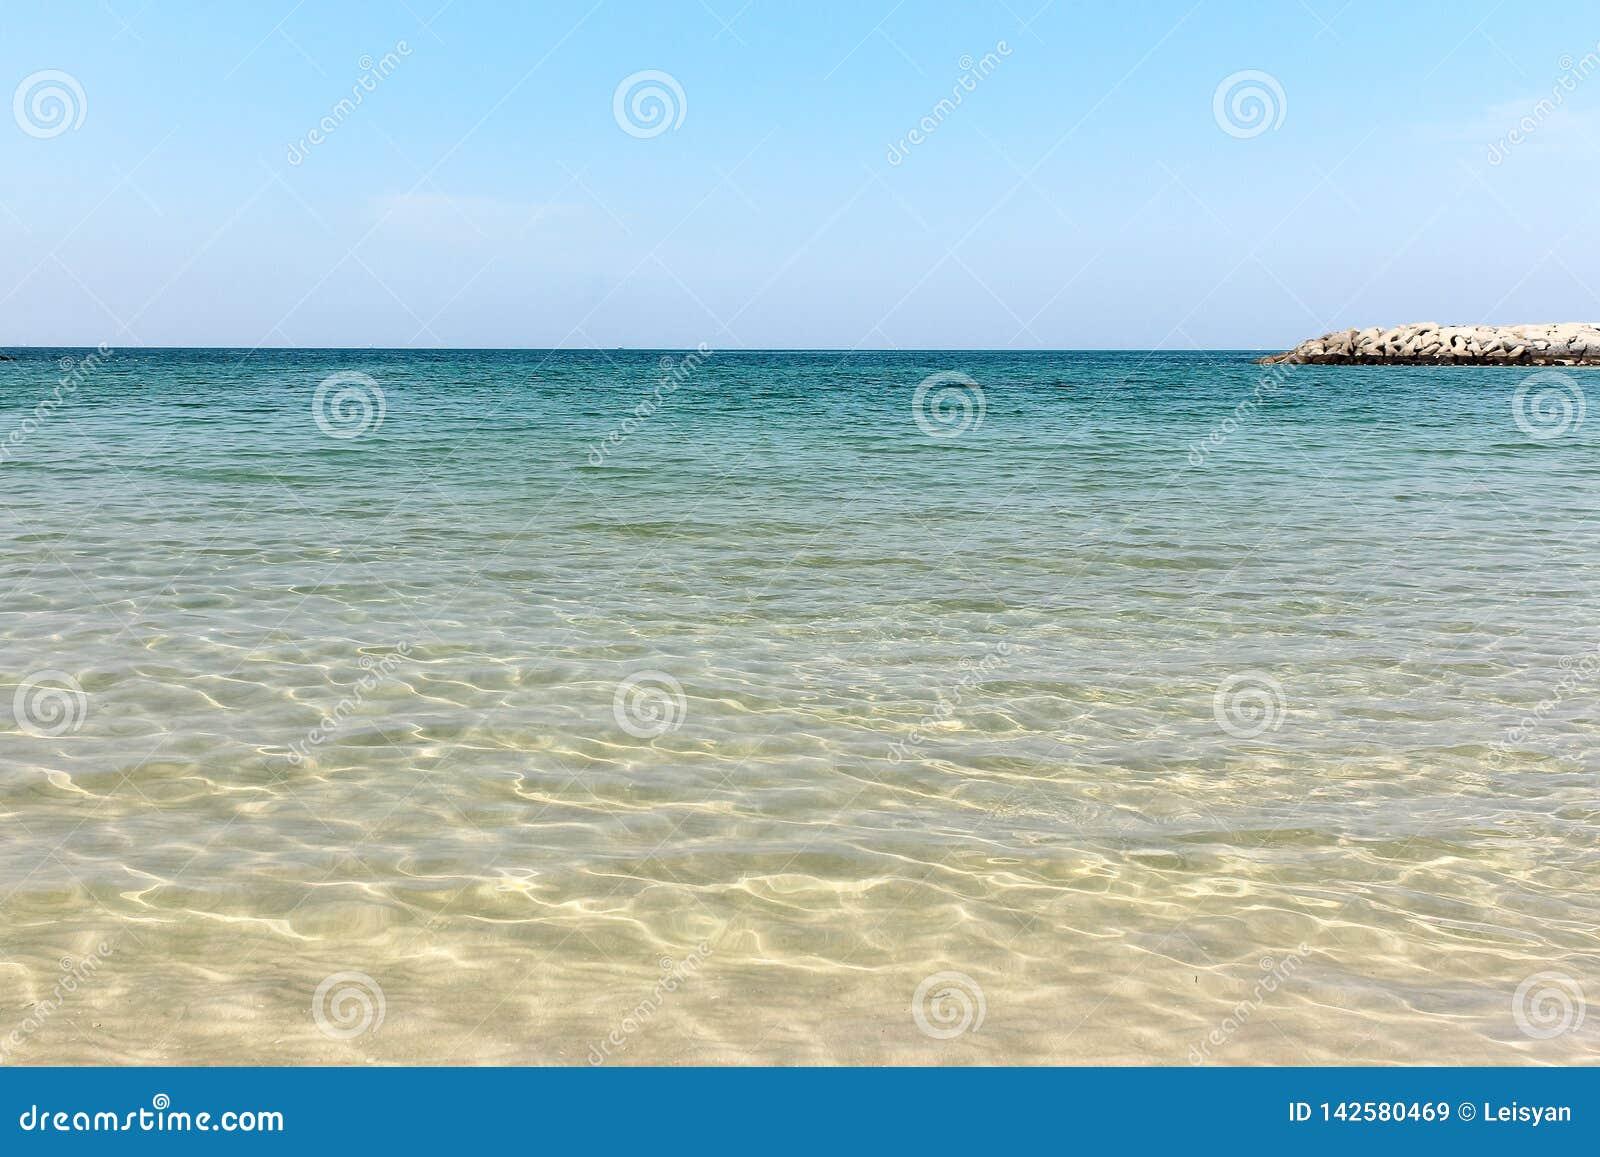 Lagoon Beach At Sunny Day Stock Image Image Of Aquamarine